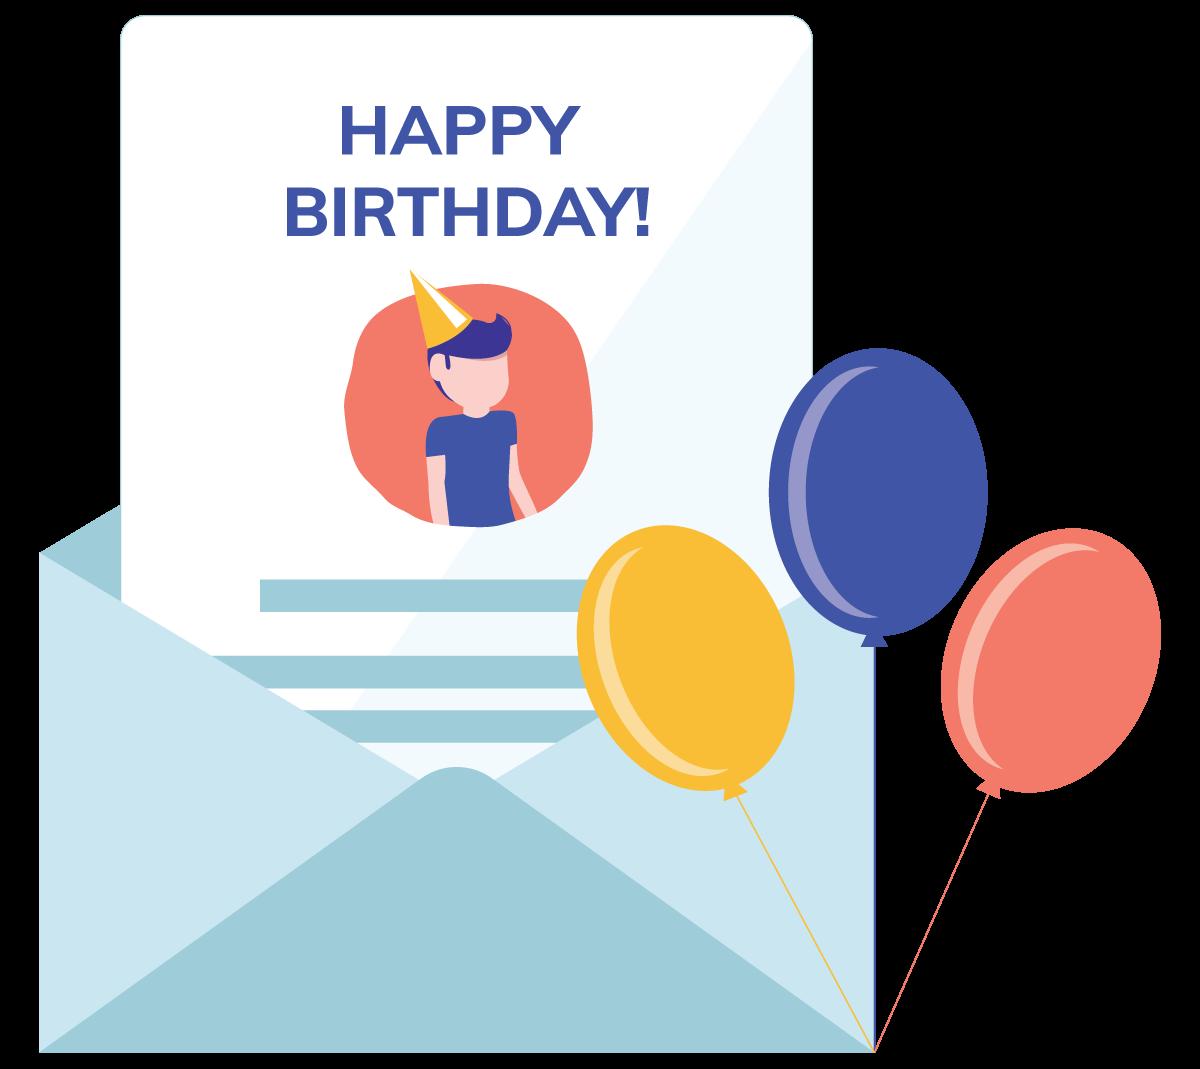 Feliciteer je klanten via Flexmail